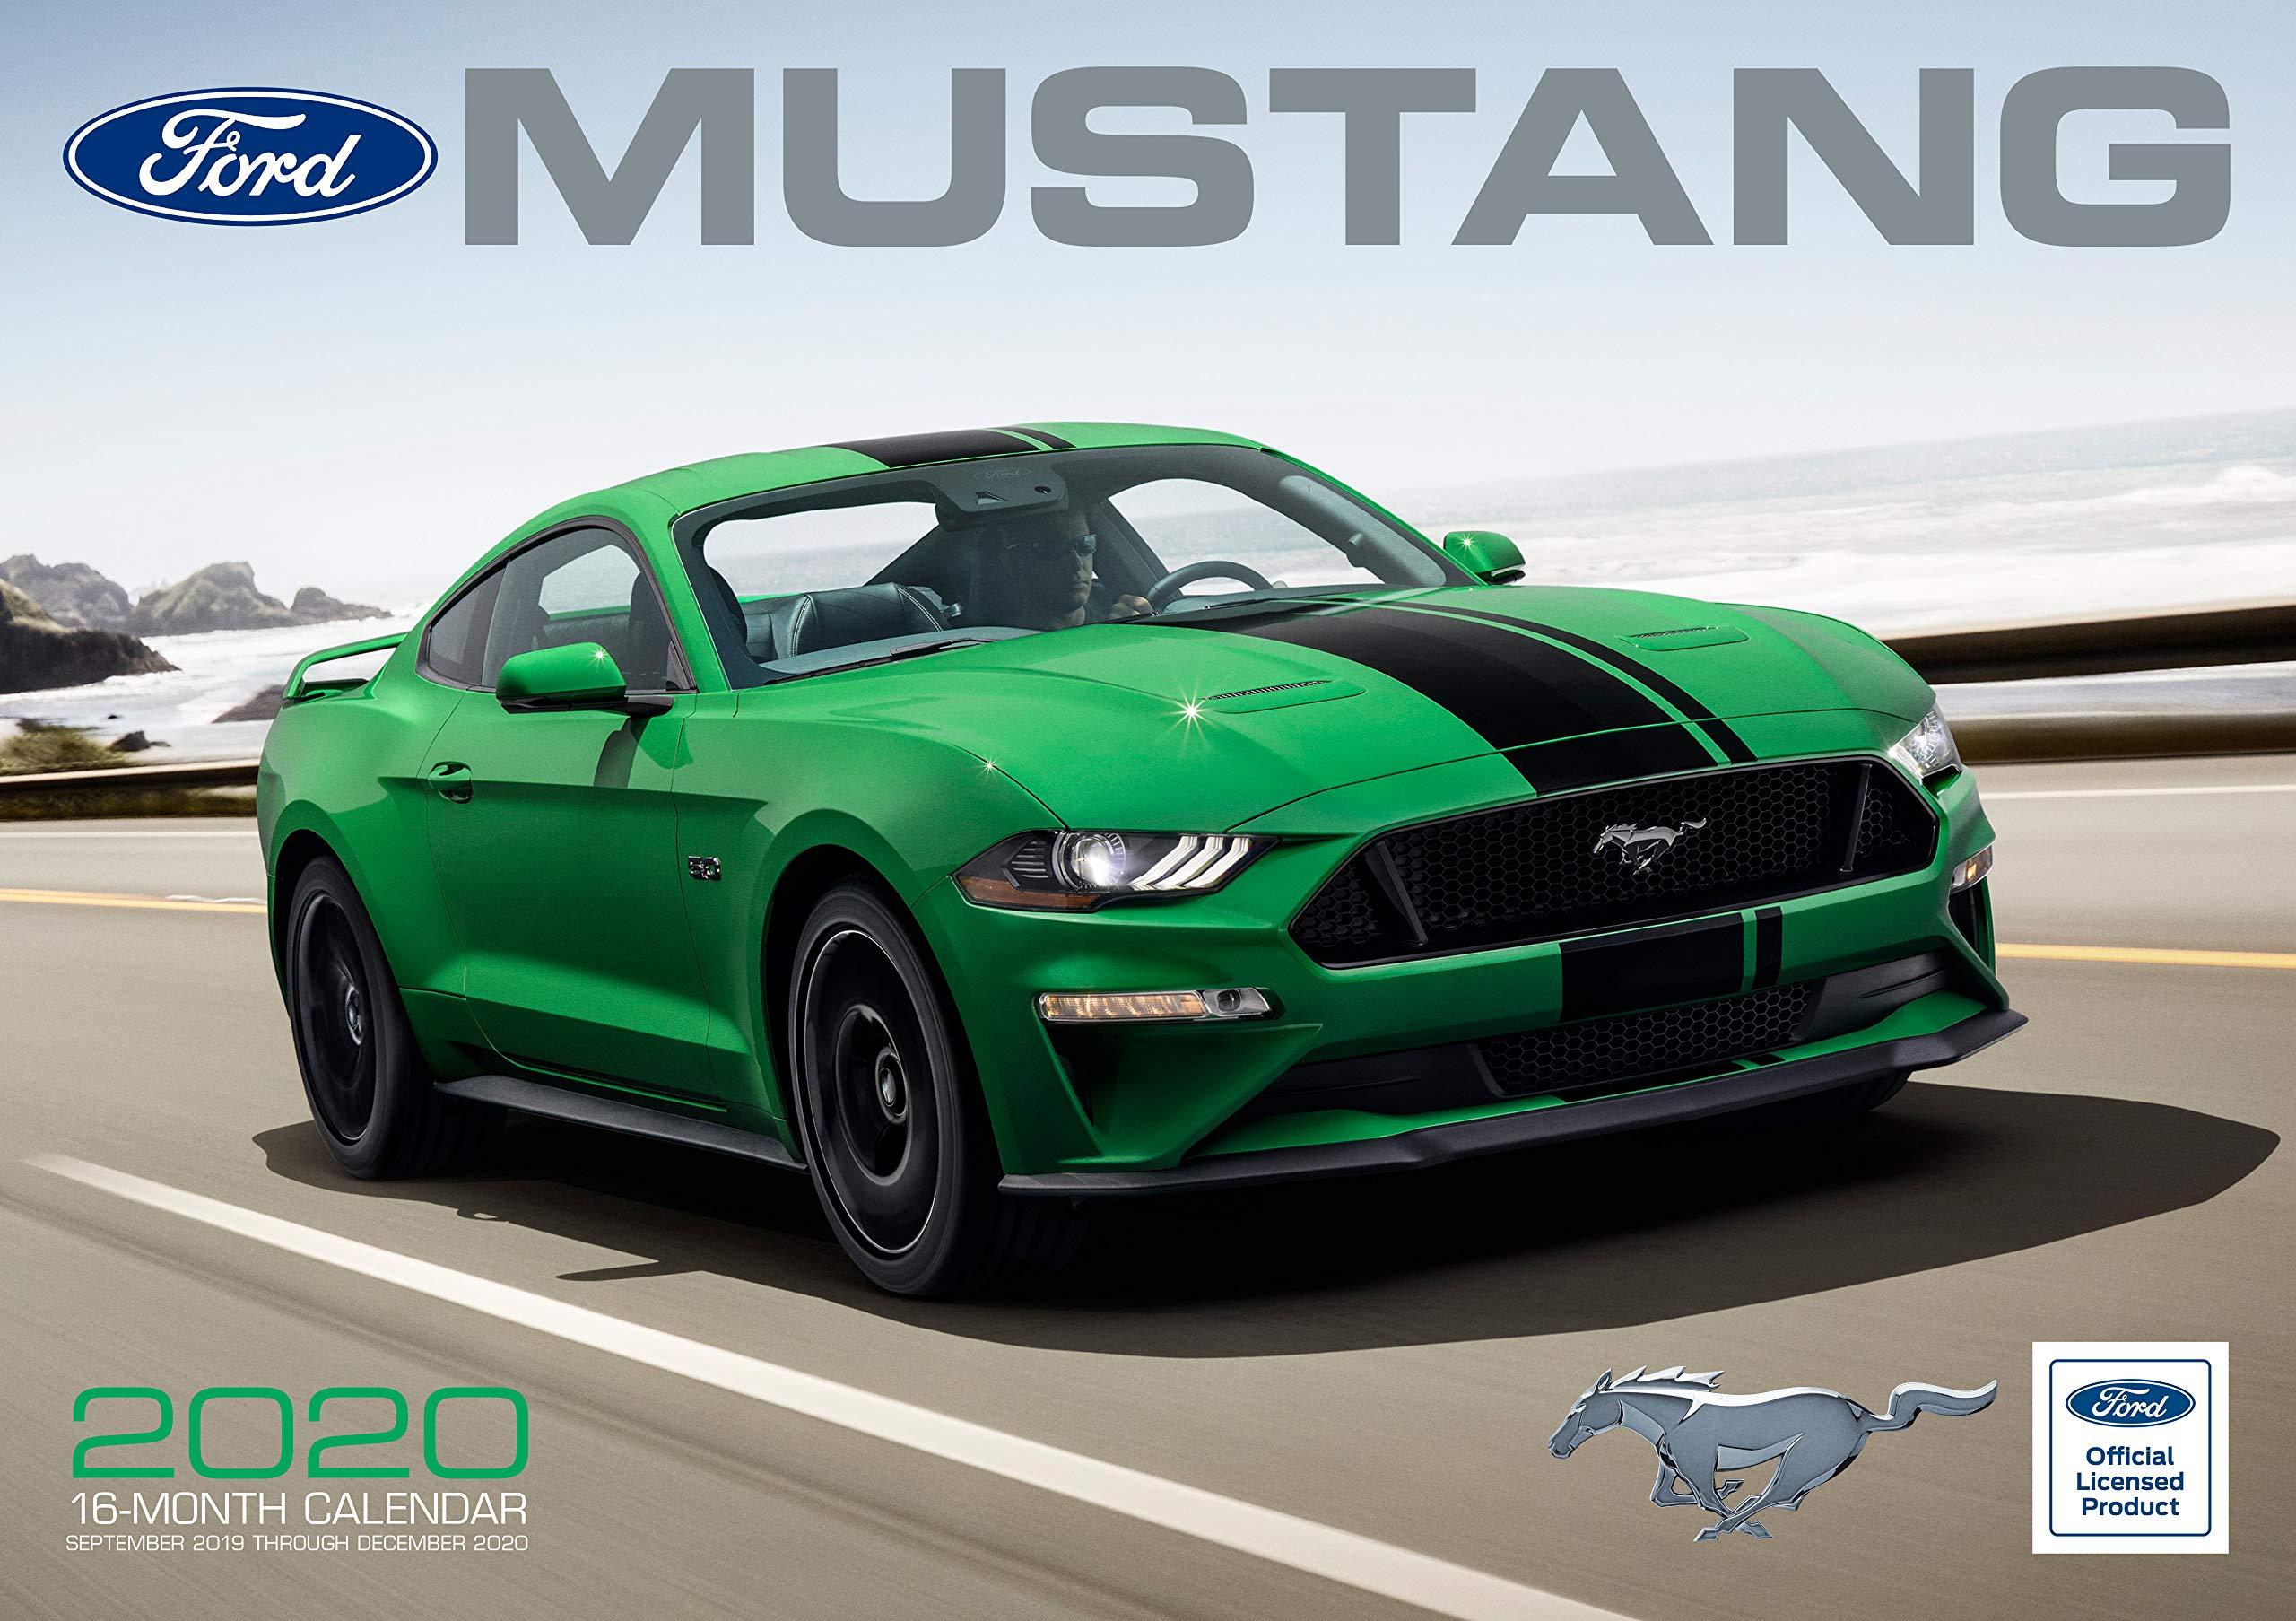 New York Movie Premiere December 2020 Calendar Ford Mustang 2020: 16 Month Calendar Includes September 2019